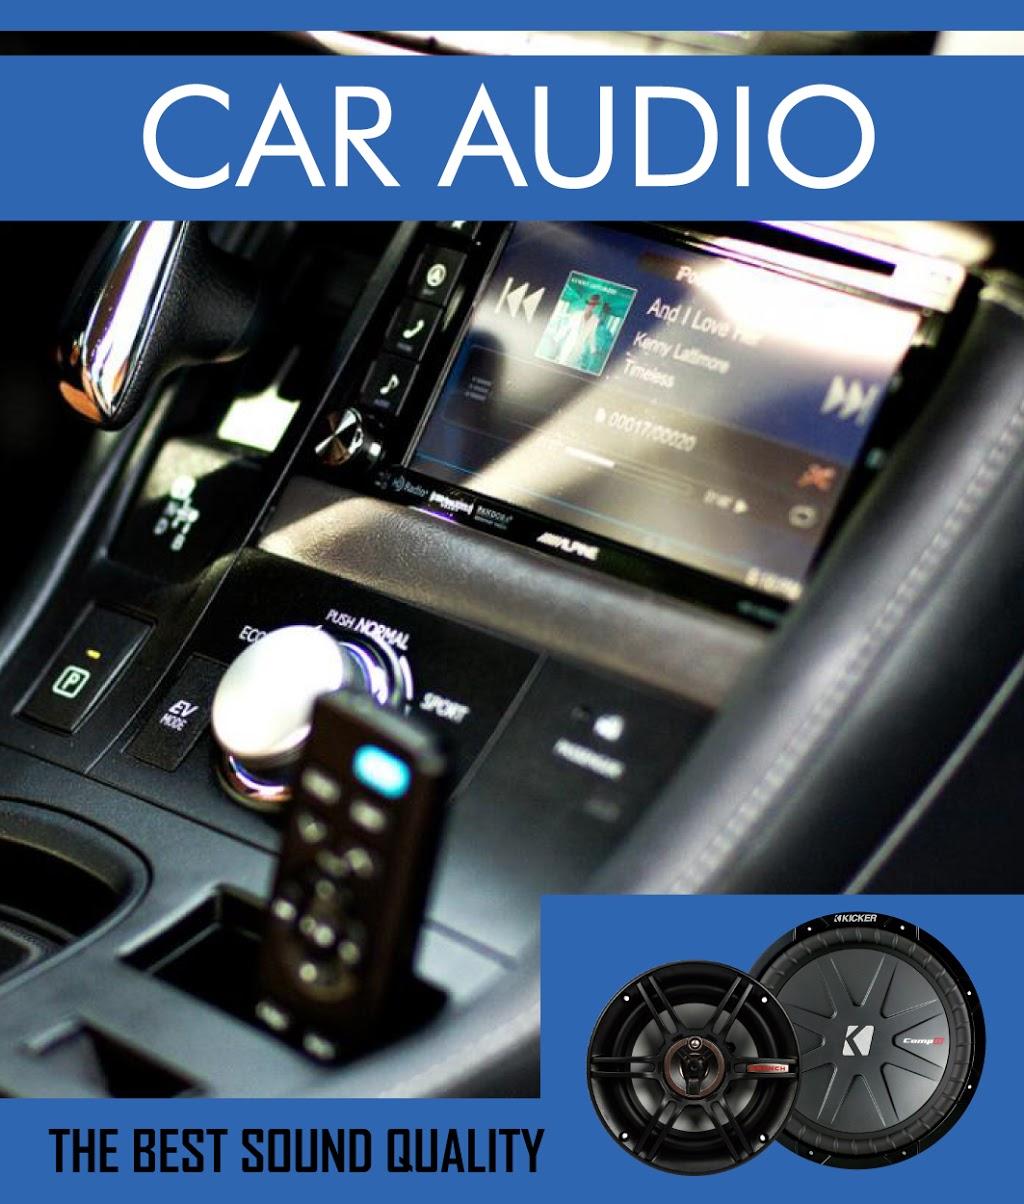 Livewire Customs - car repair  | Photo 7 of 10 | Address: 1309 W Texas St, Fairfield, CA 94533, USA | Phone: (707) 389-4969